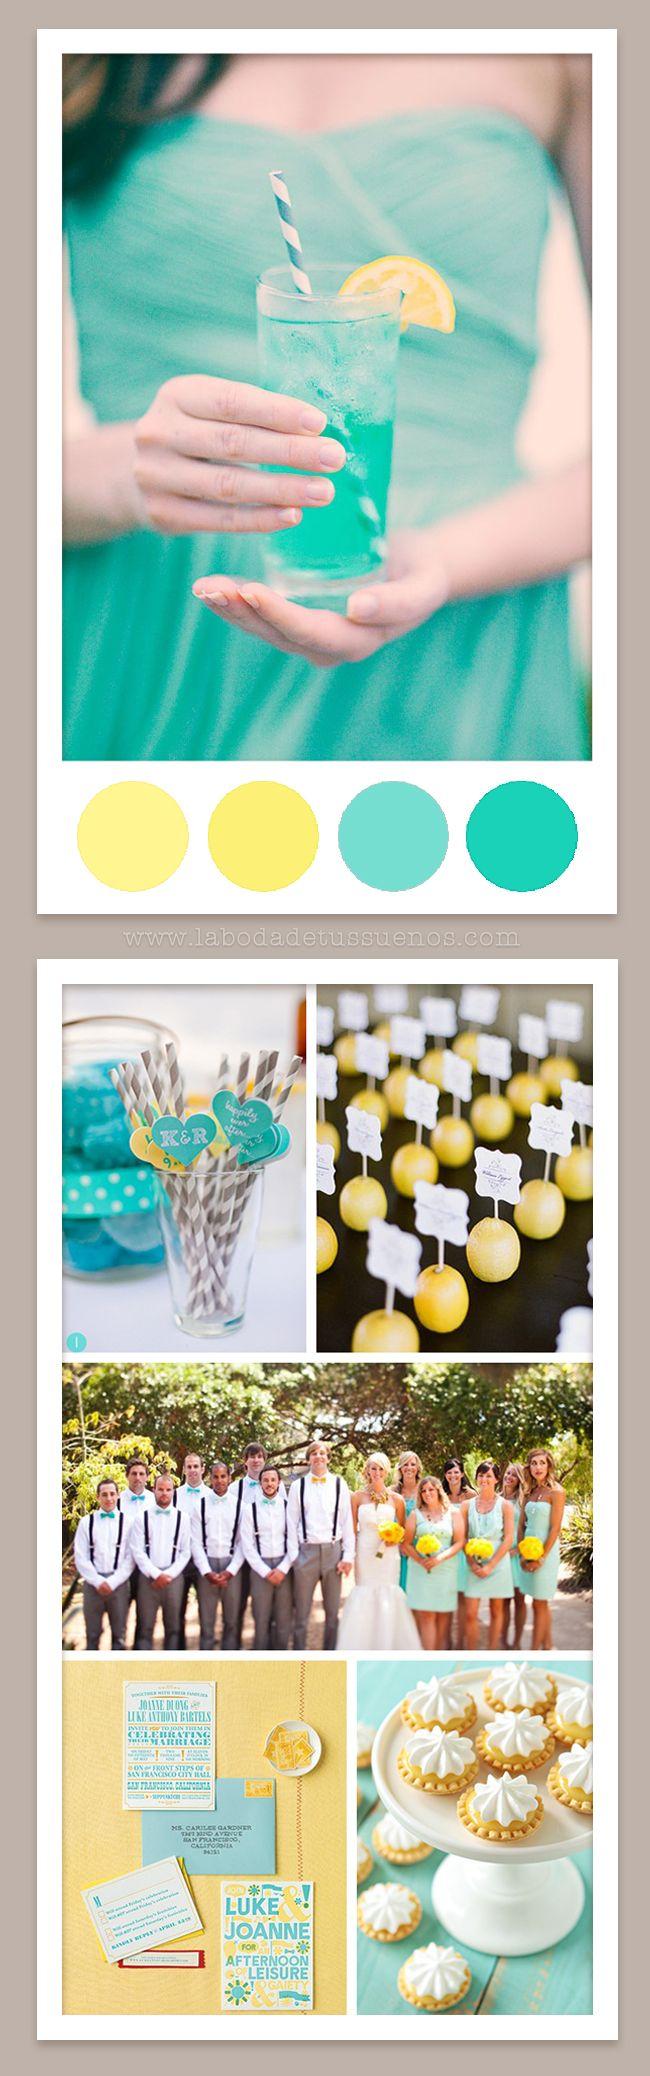 Aqua & Yellow wedding colorboard